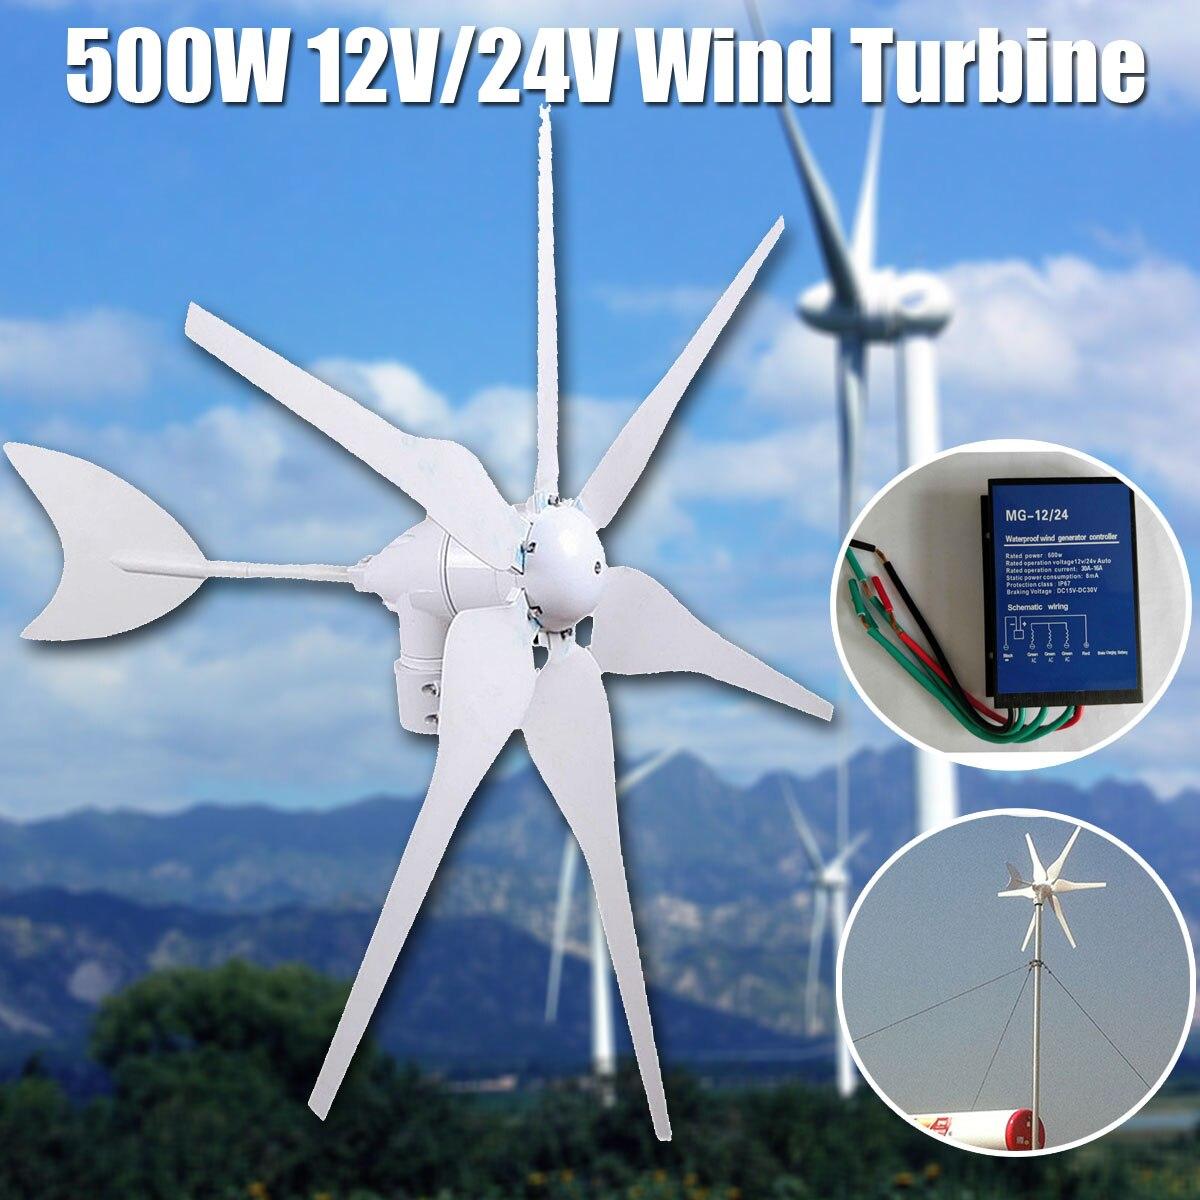 12V/24V 500W Generator Miniature Wind Turbines Energy Environmental 6 Blades Mini Wind Turbines Residential Home With Controller12V/24V 500W Generator Miniature Wind Turbines Energy Environmental 6 Blades Mini Wind Turbines Residential Home With Controller